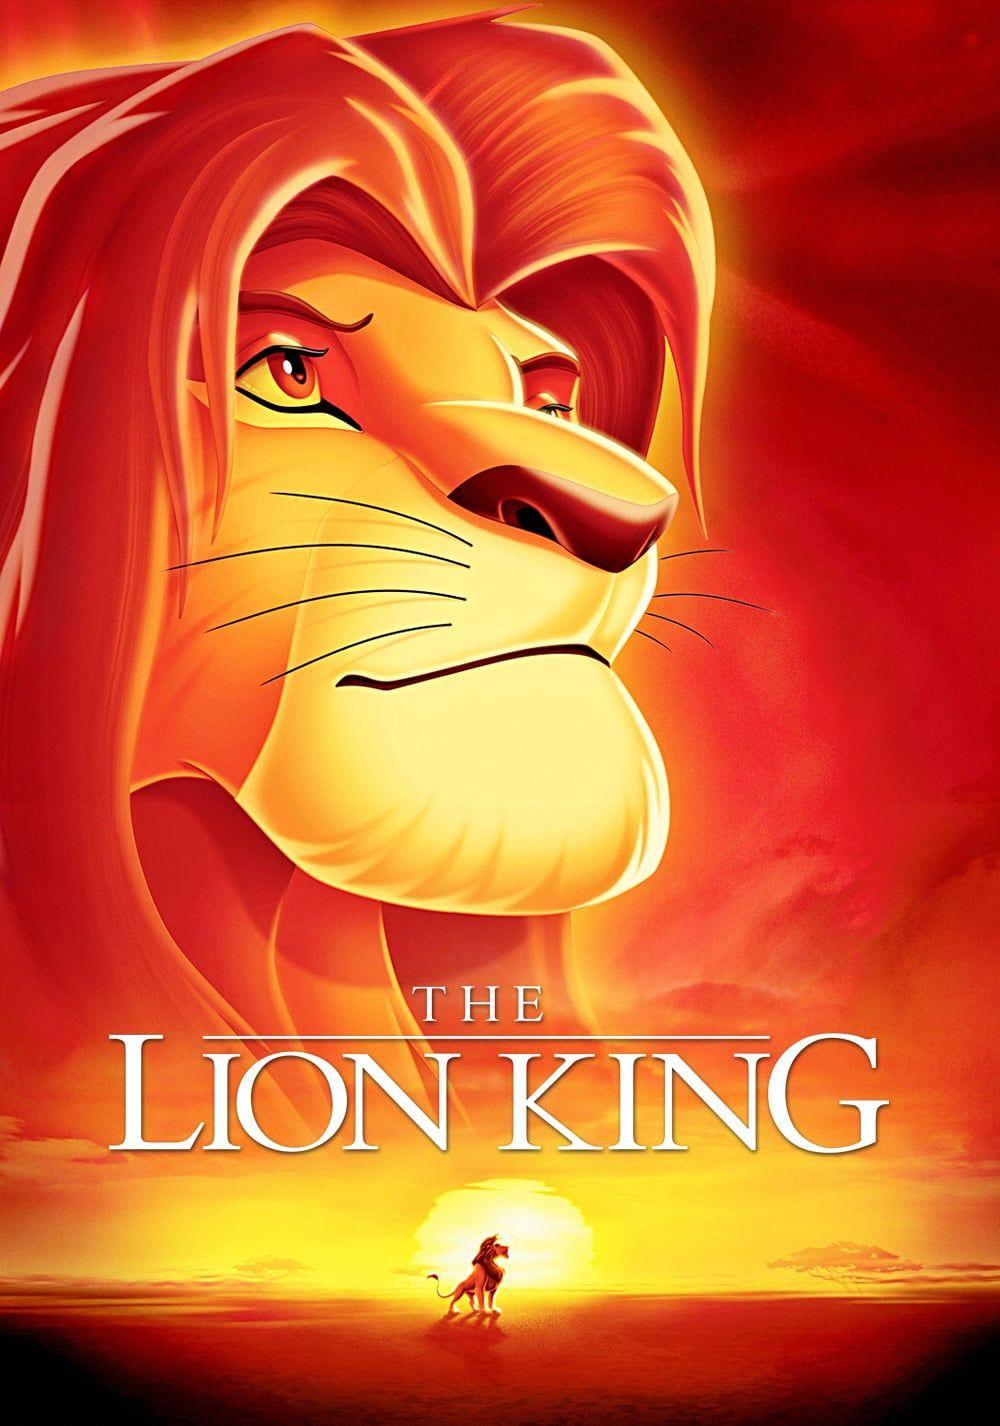 Картинки львом королю король лев, открытки летию